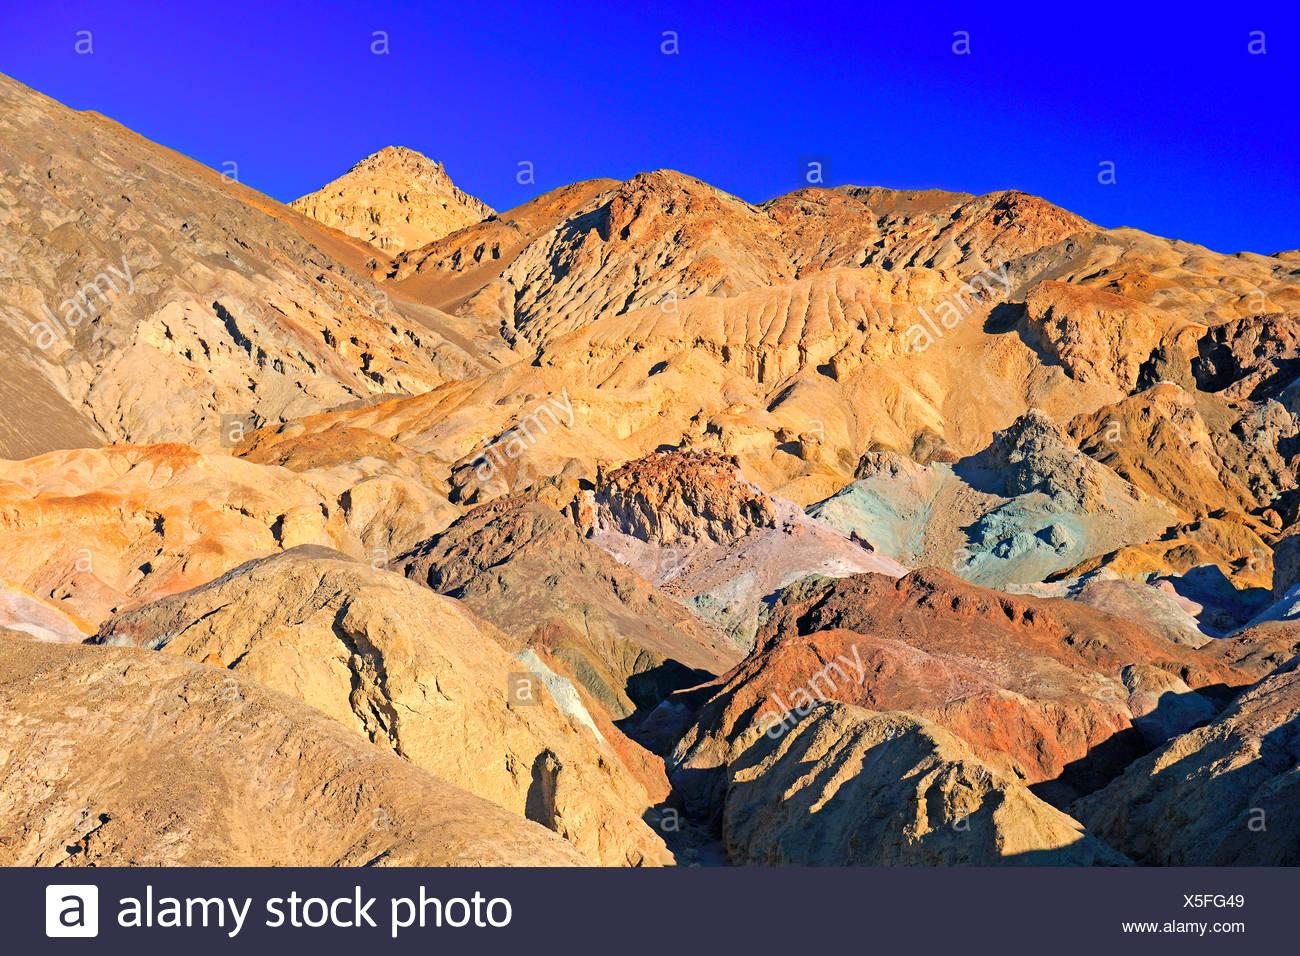 Minerals Rocks Stock Photos & Minerals Rocks Stock Images - Alamy